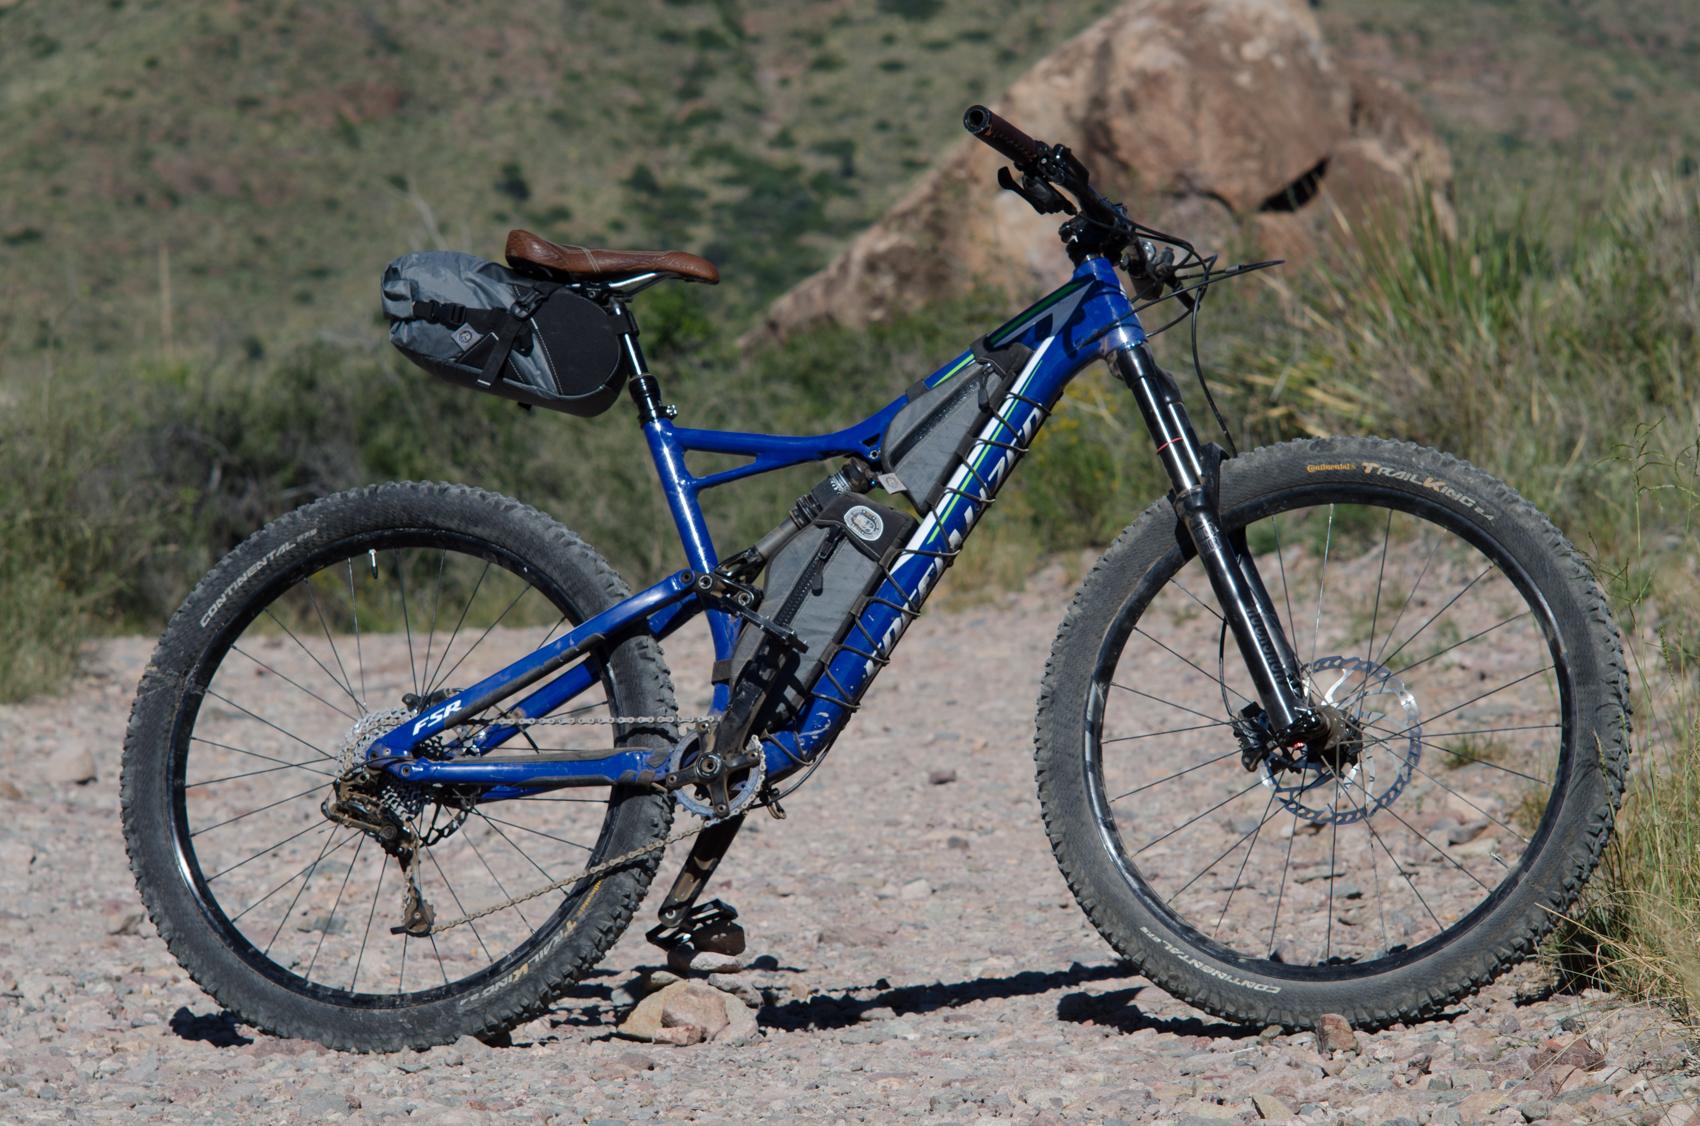 Mountain biking in big bend national park-leh cycling goods-14.jpg